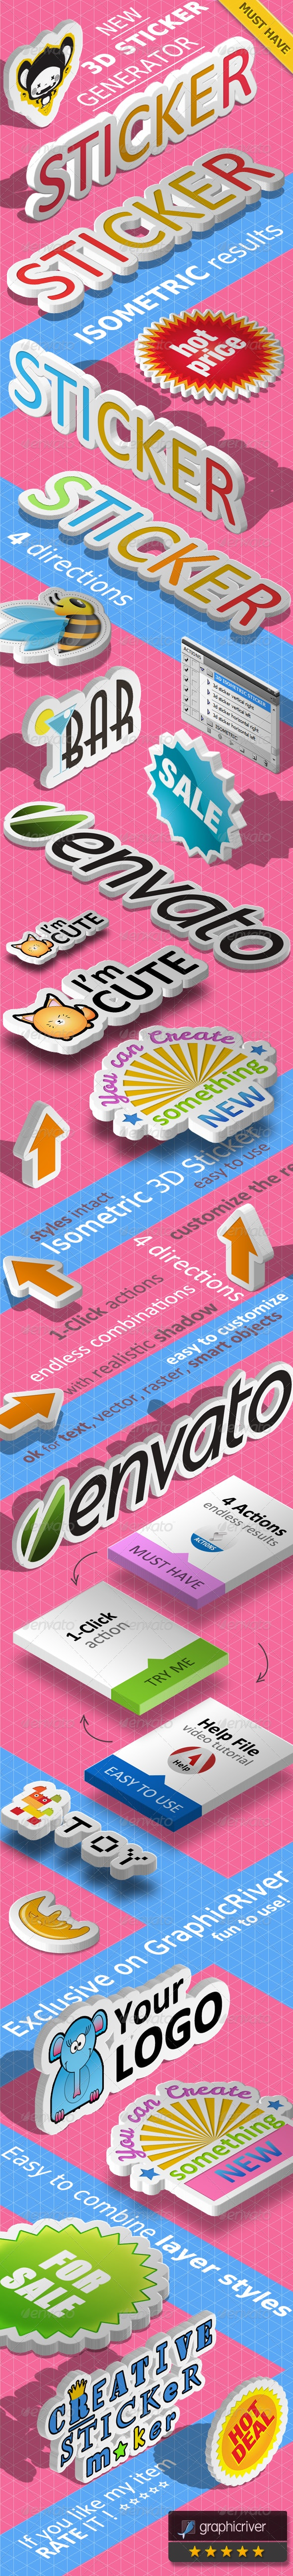 3D Isometric Sticker Photoshop Action - Actions Photoshop